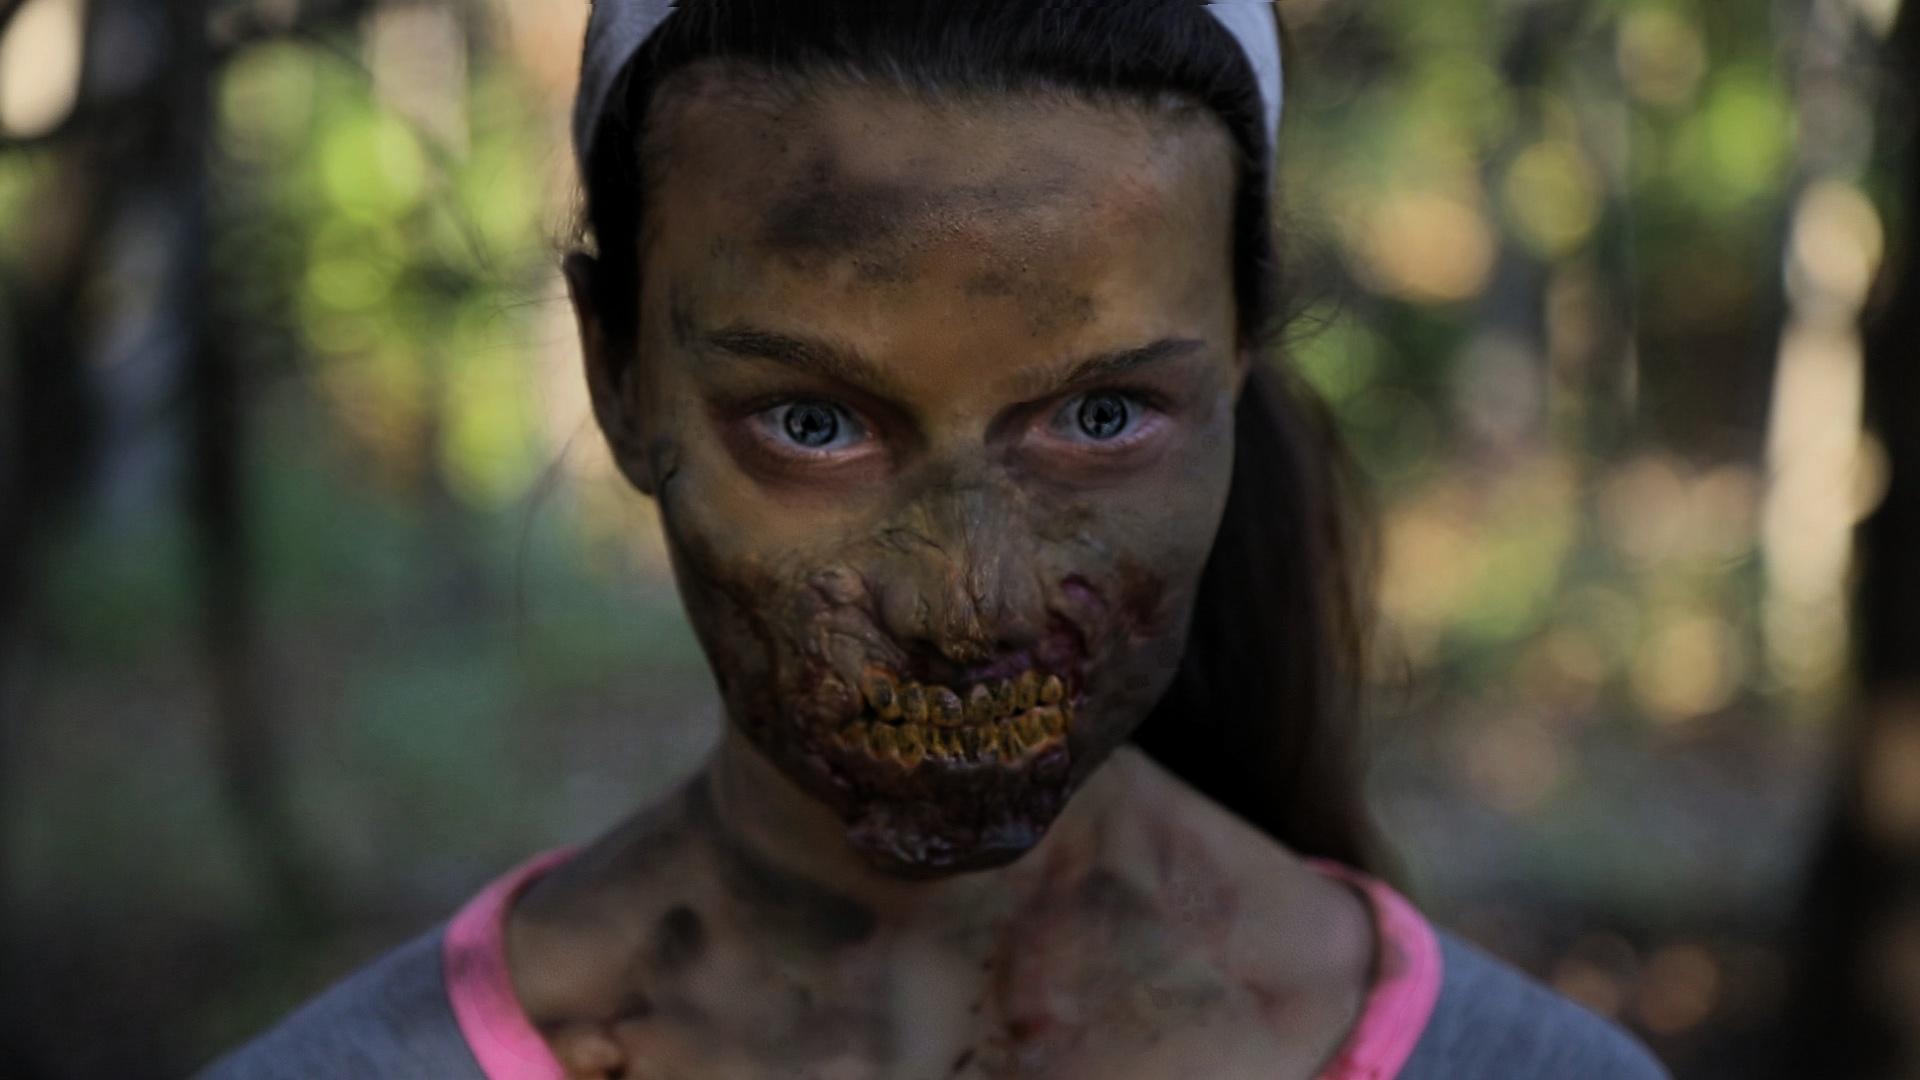 Sydney Zombie w Changed Eyes Revised